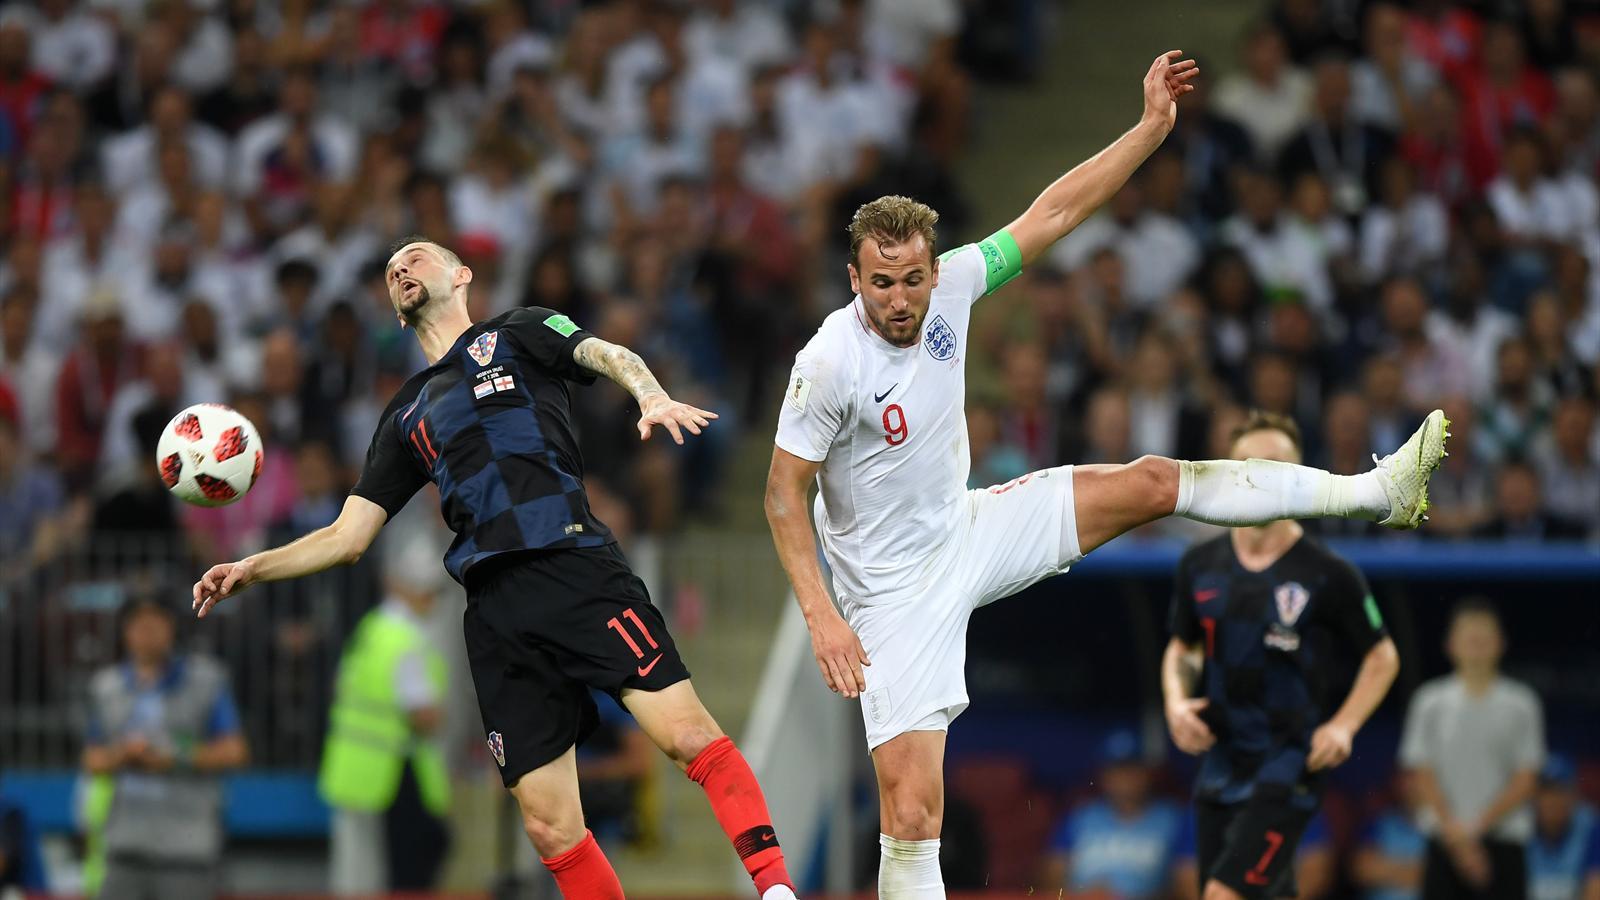 En direct live croatie angleterre coupe du monde 11 juillet 2018 eurosport - Calendrier coupe d angleterre ...